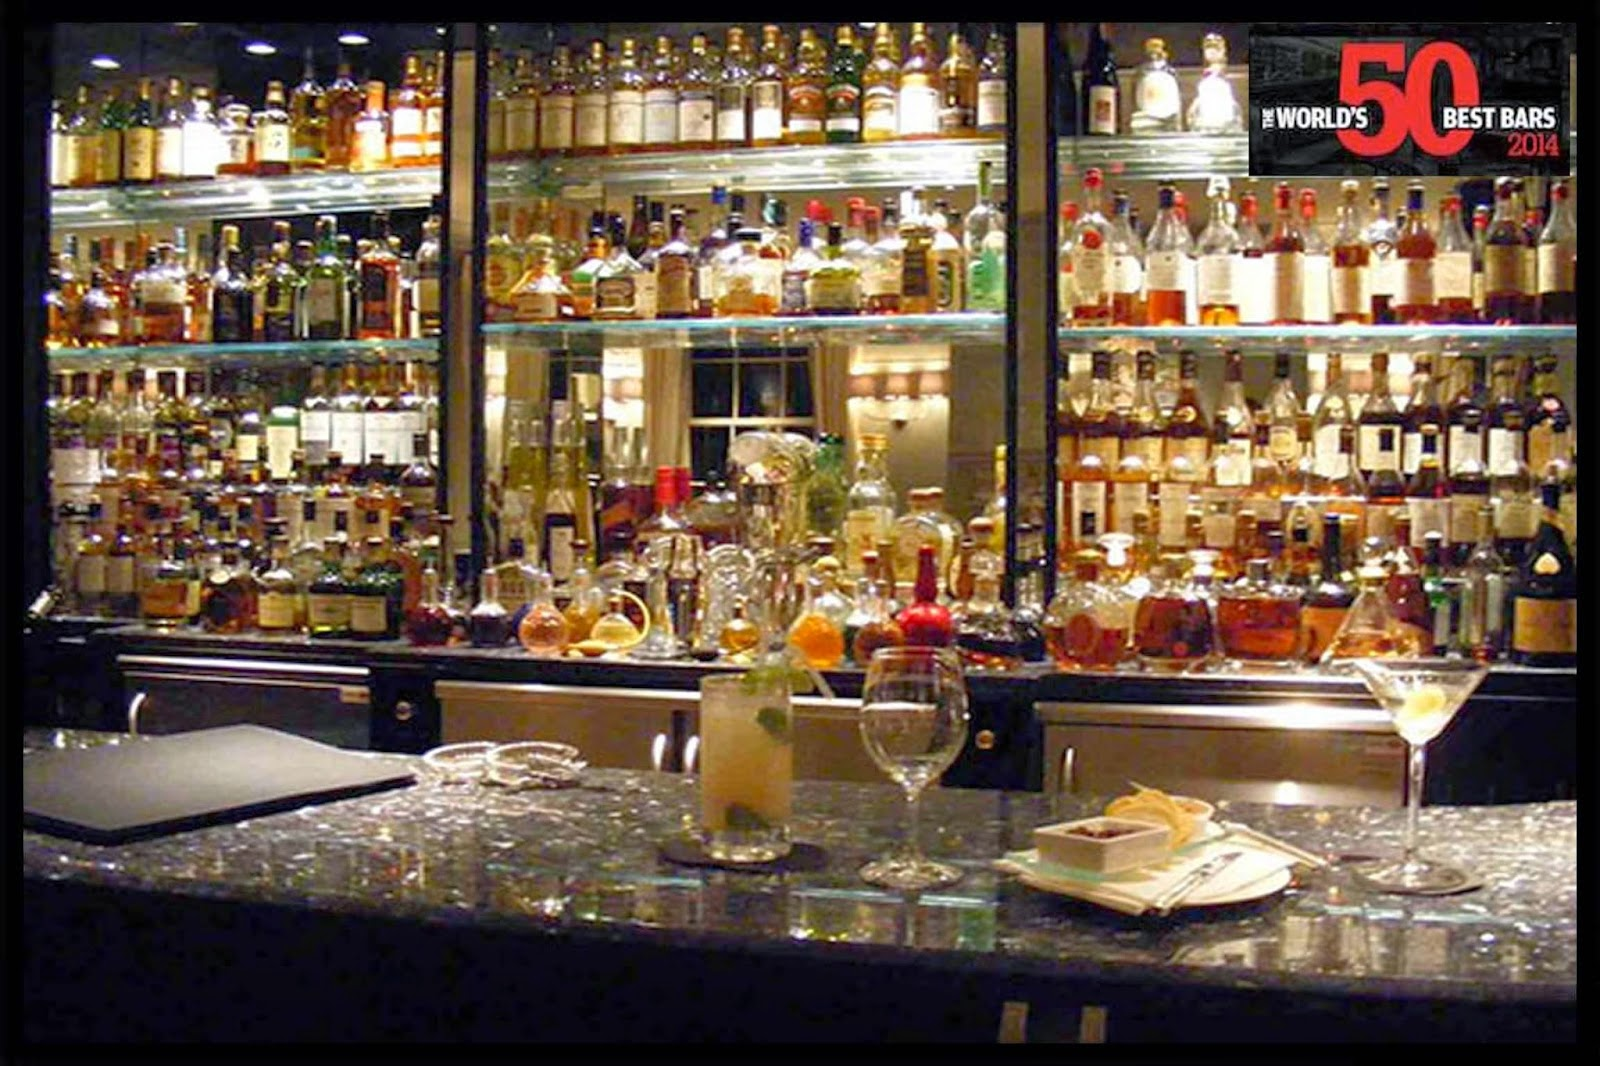 mejores bares